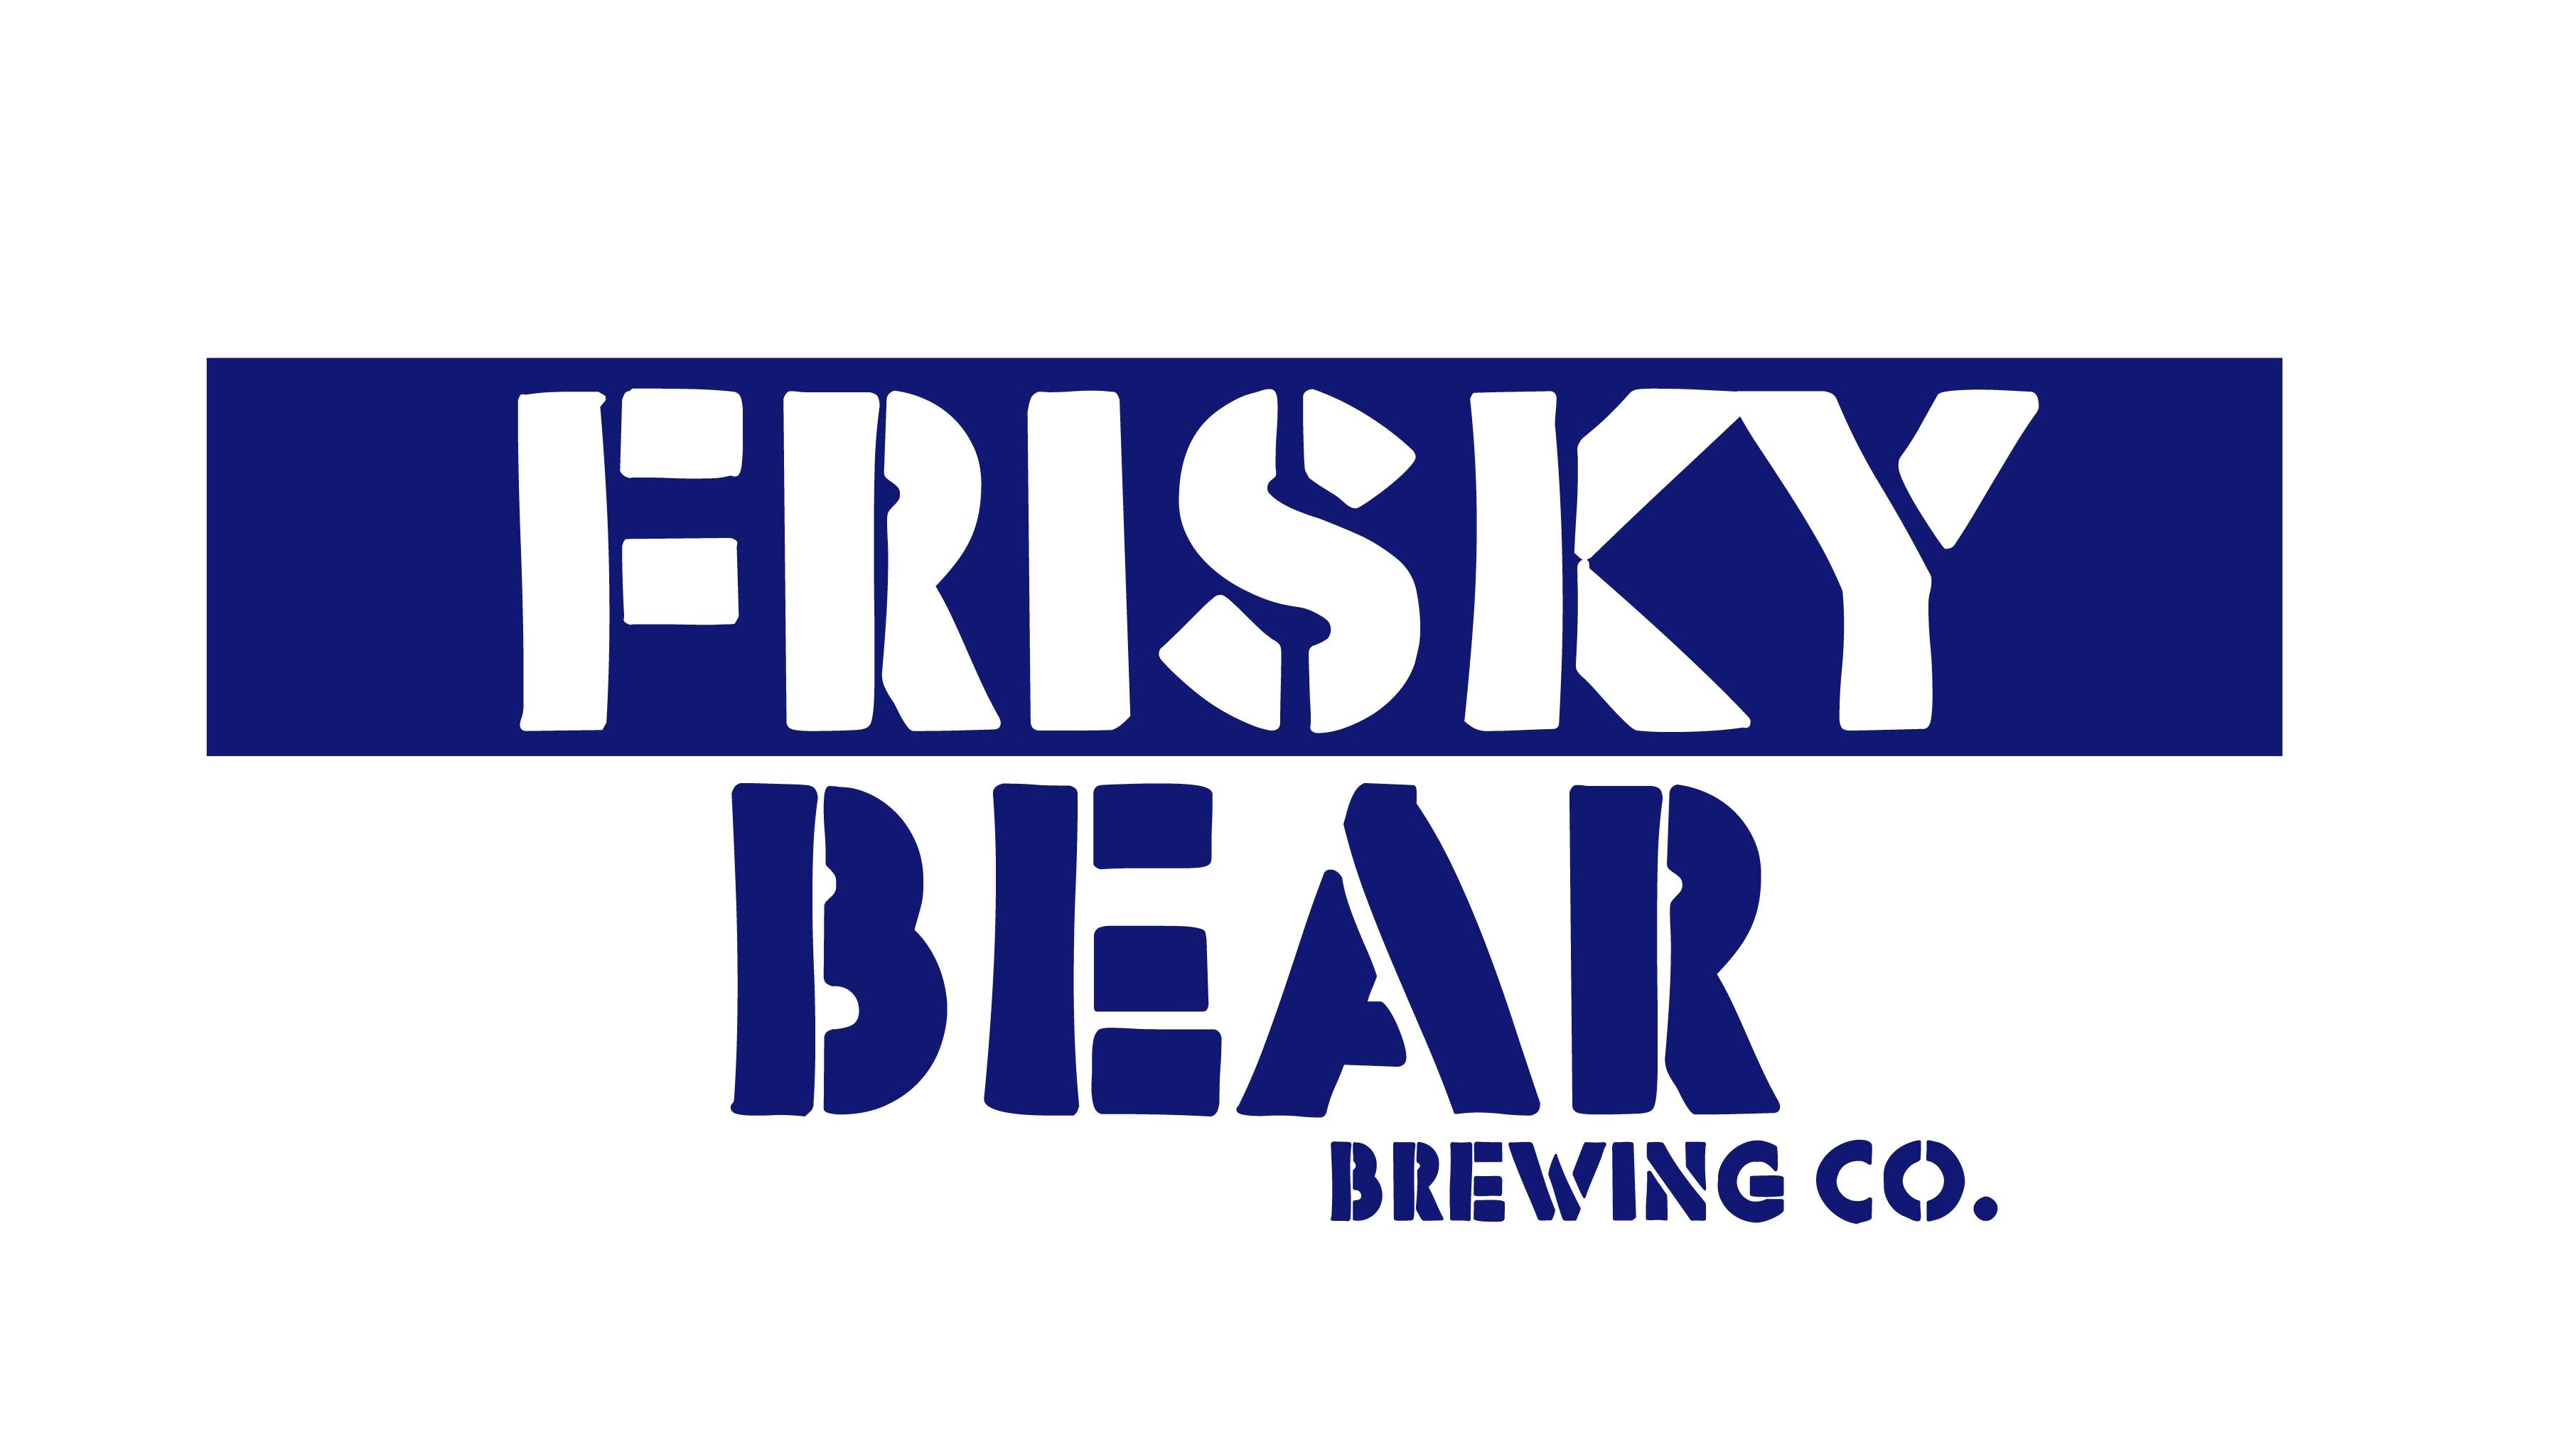 Frisky Bear brewing